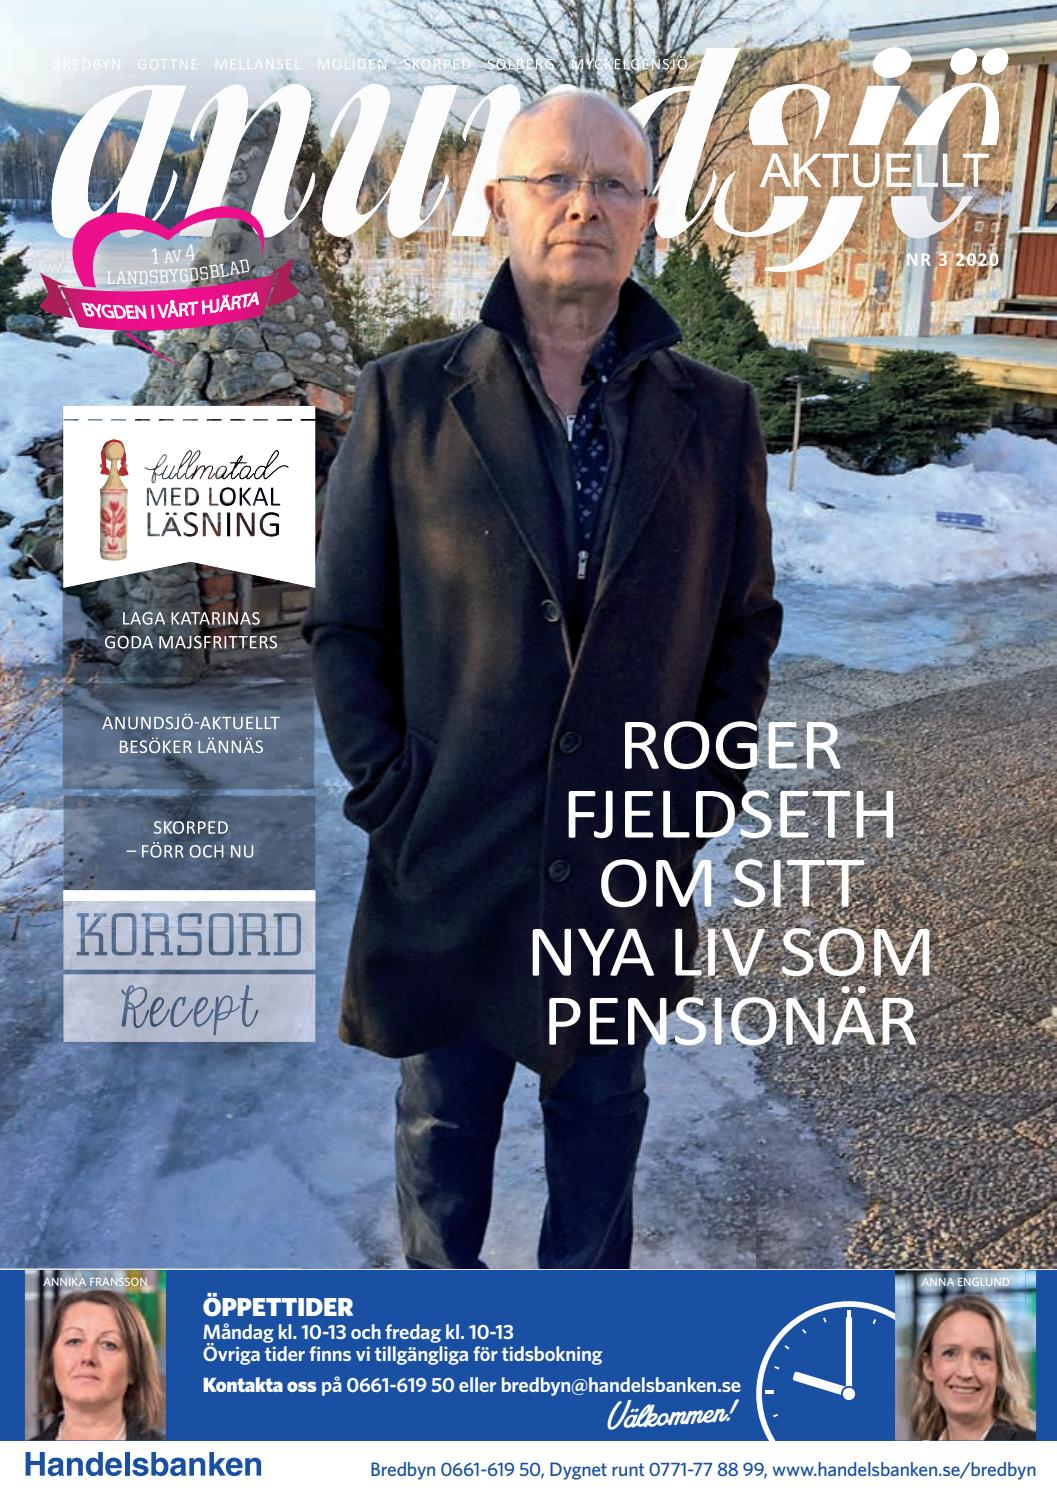 Pr Helgesson Sjnsvgen 1A, Bredbyn - satisfaction-survey.net